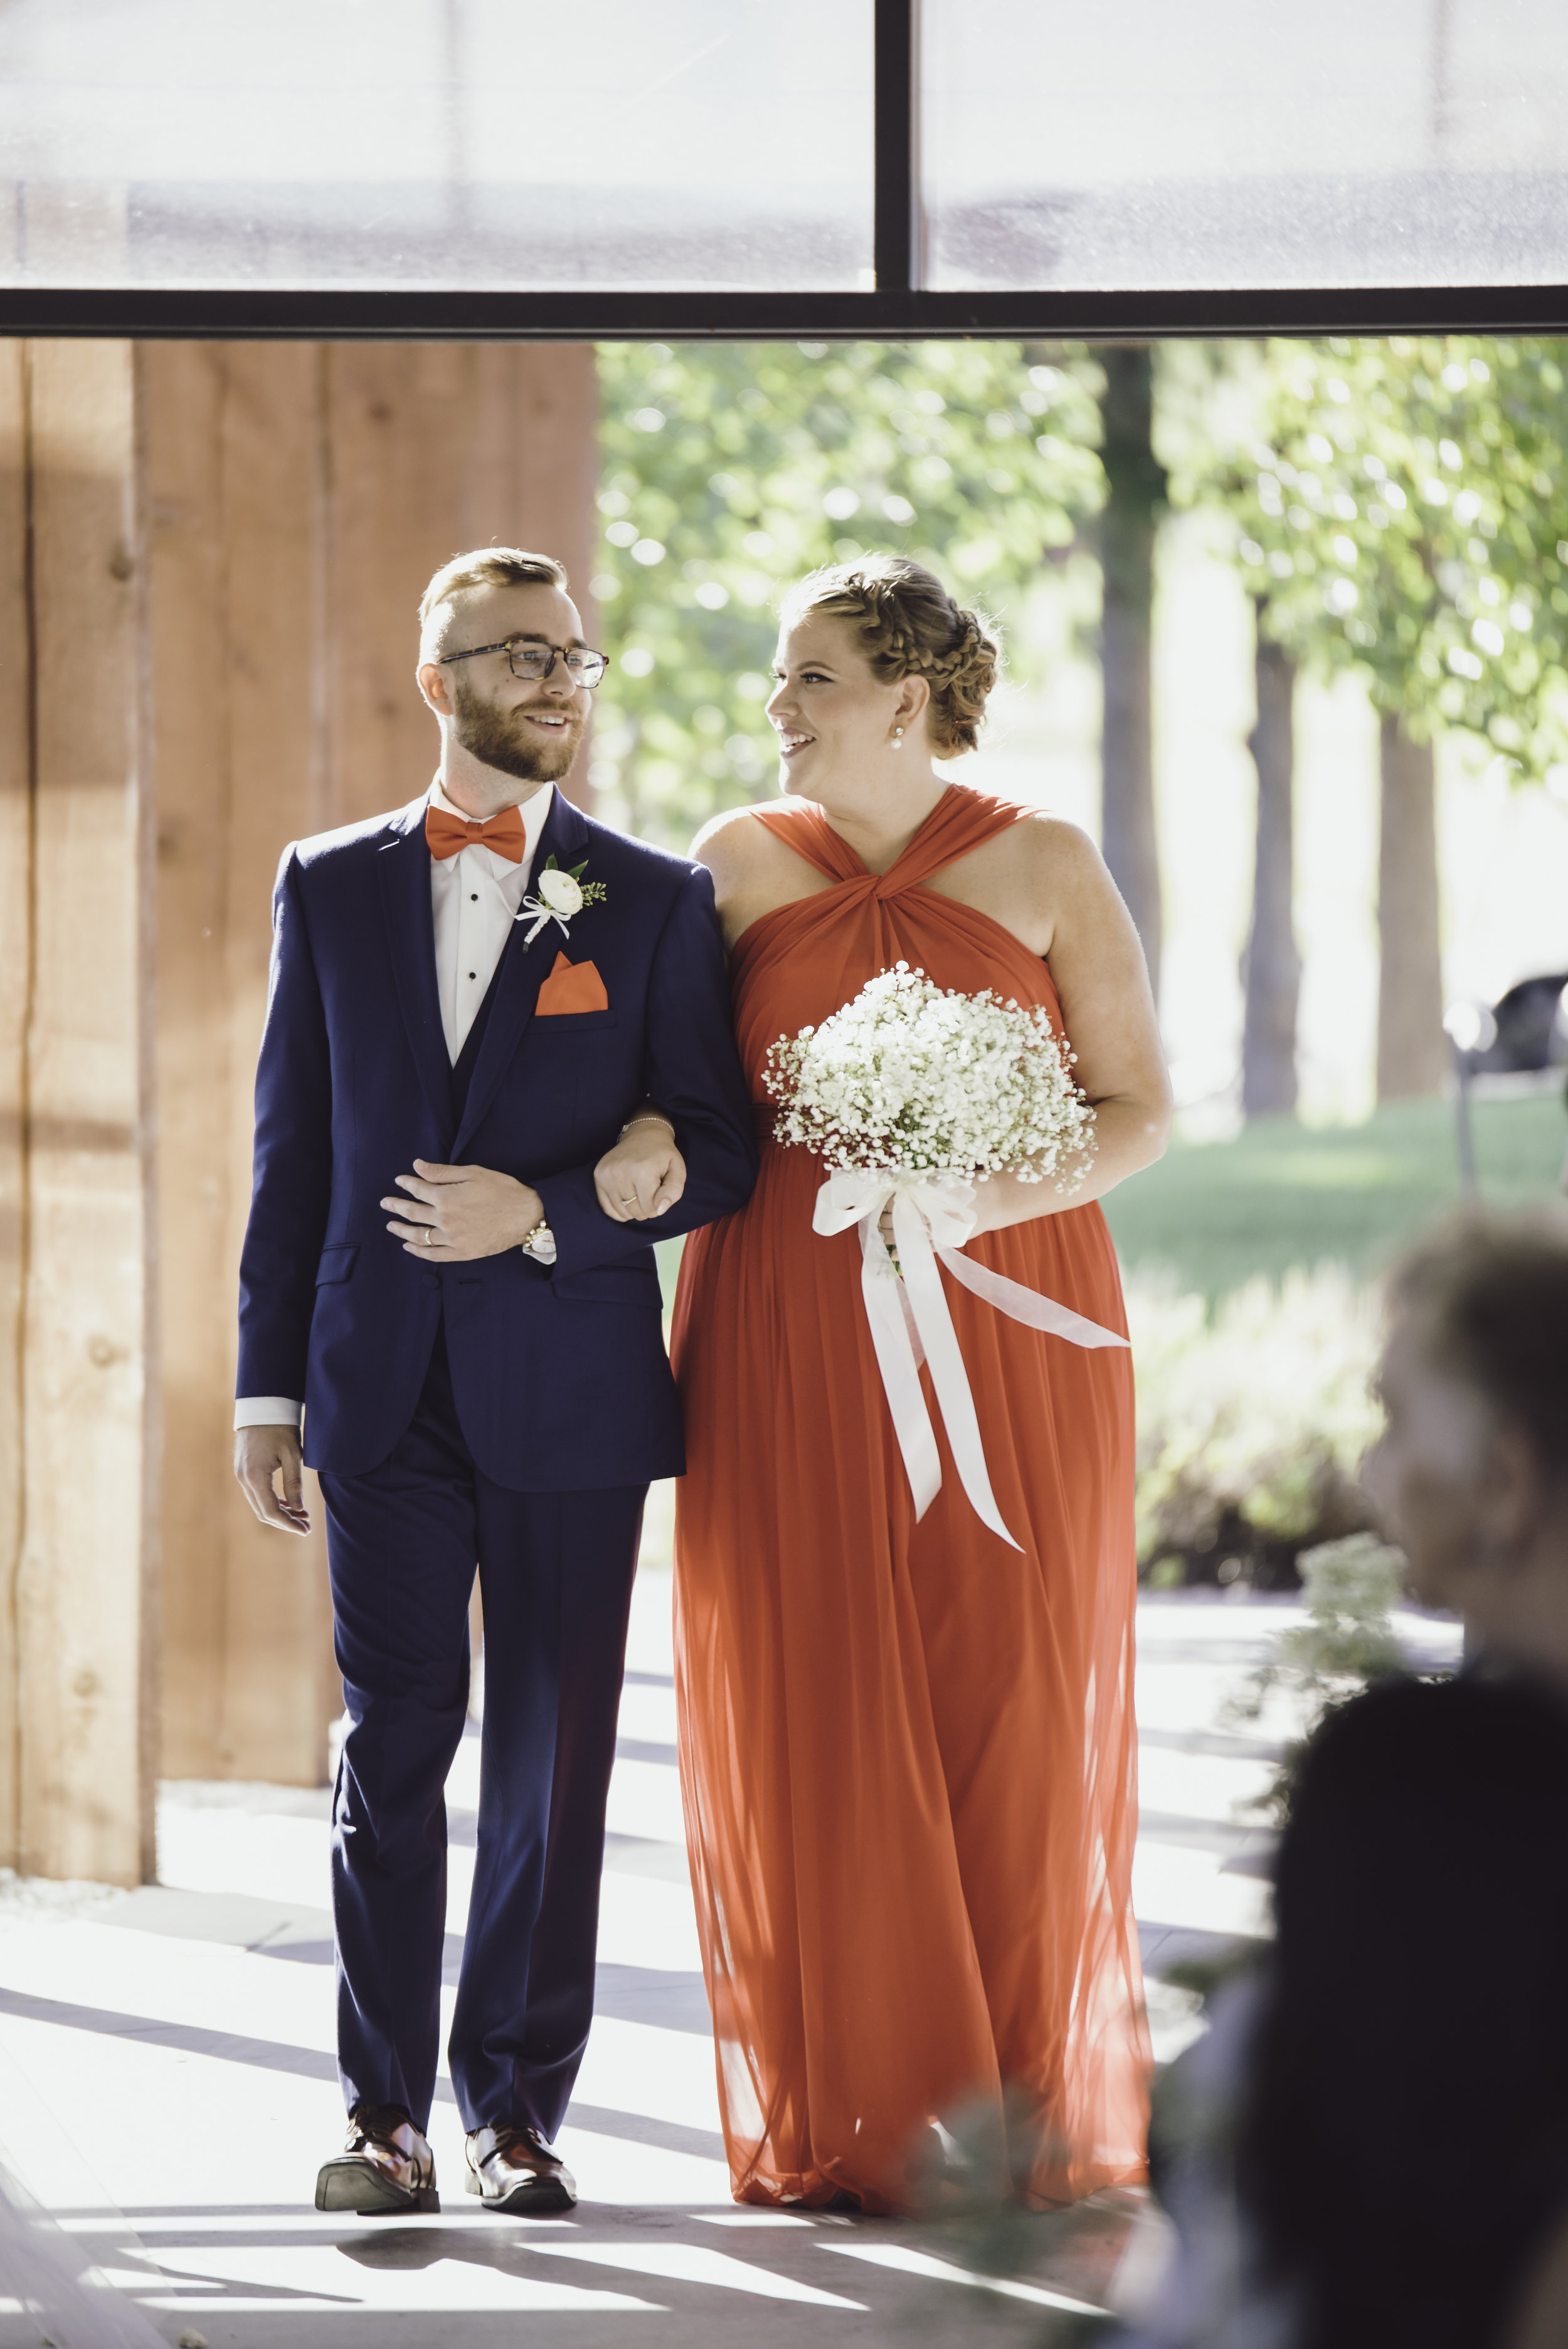 Will&Steph wedding -304.jpg